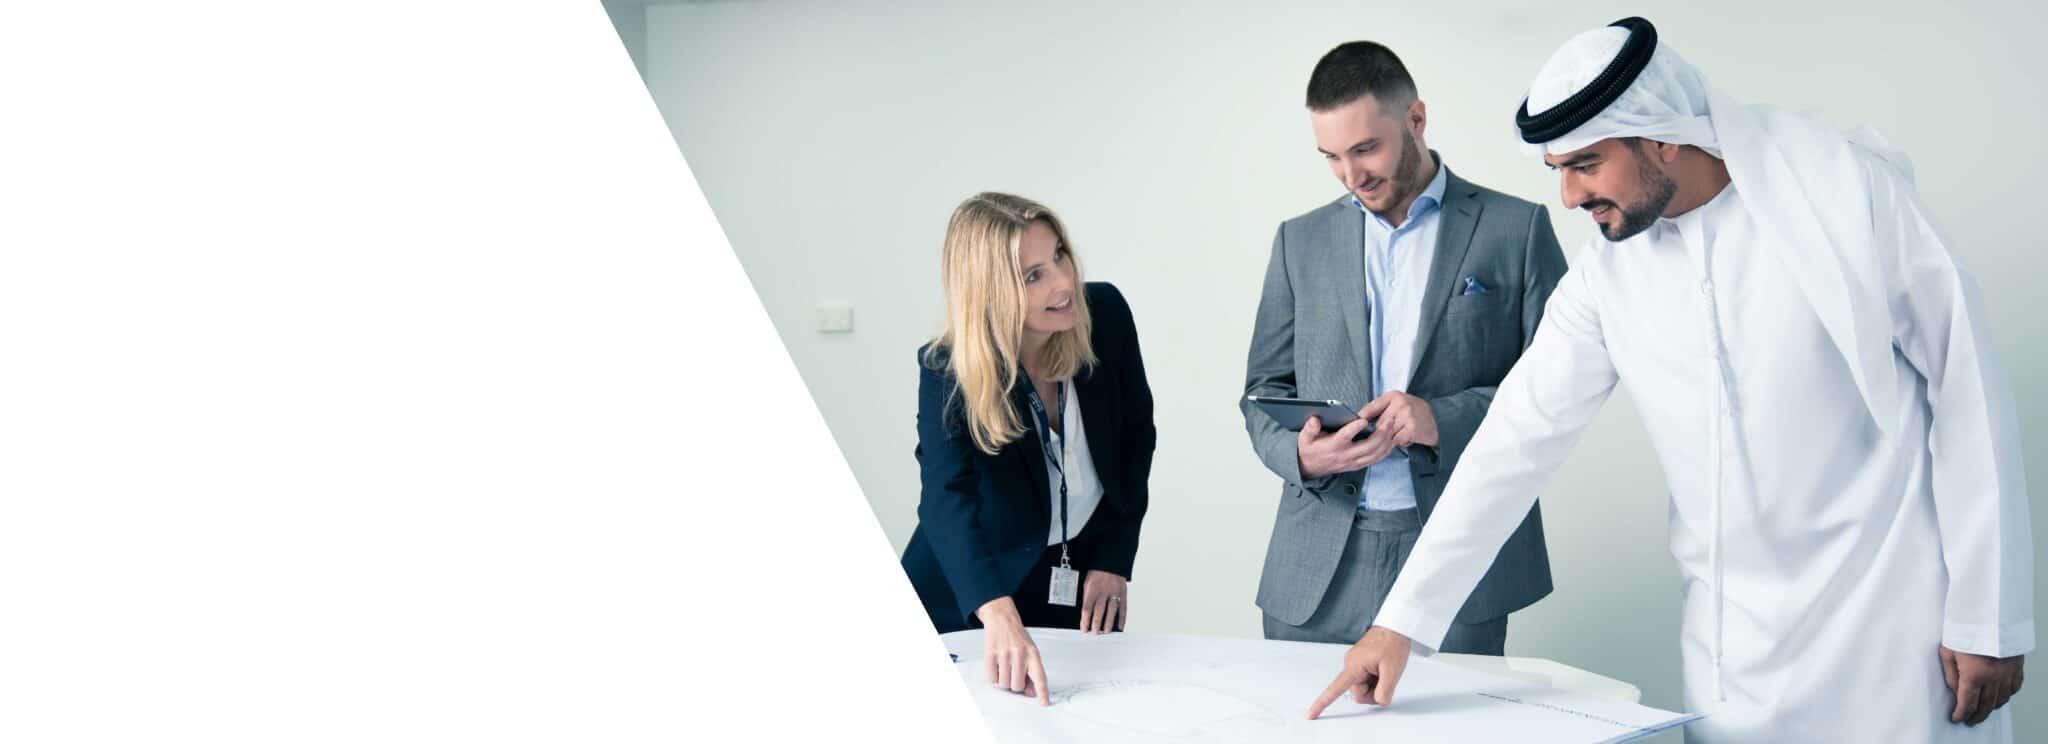 Transguard Group Announces First International Venture